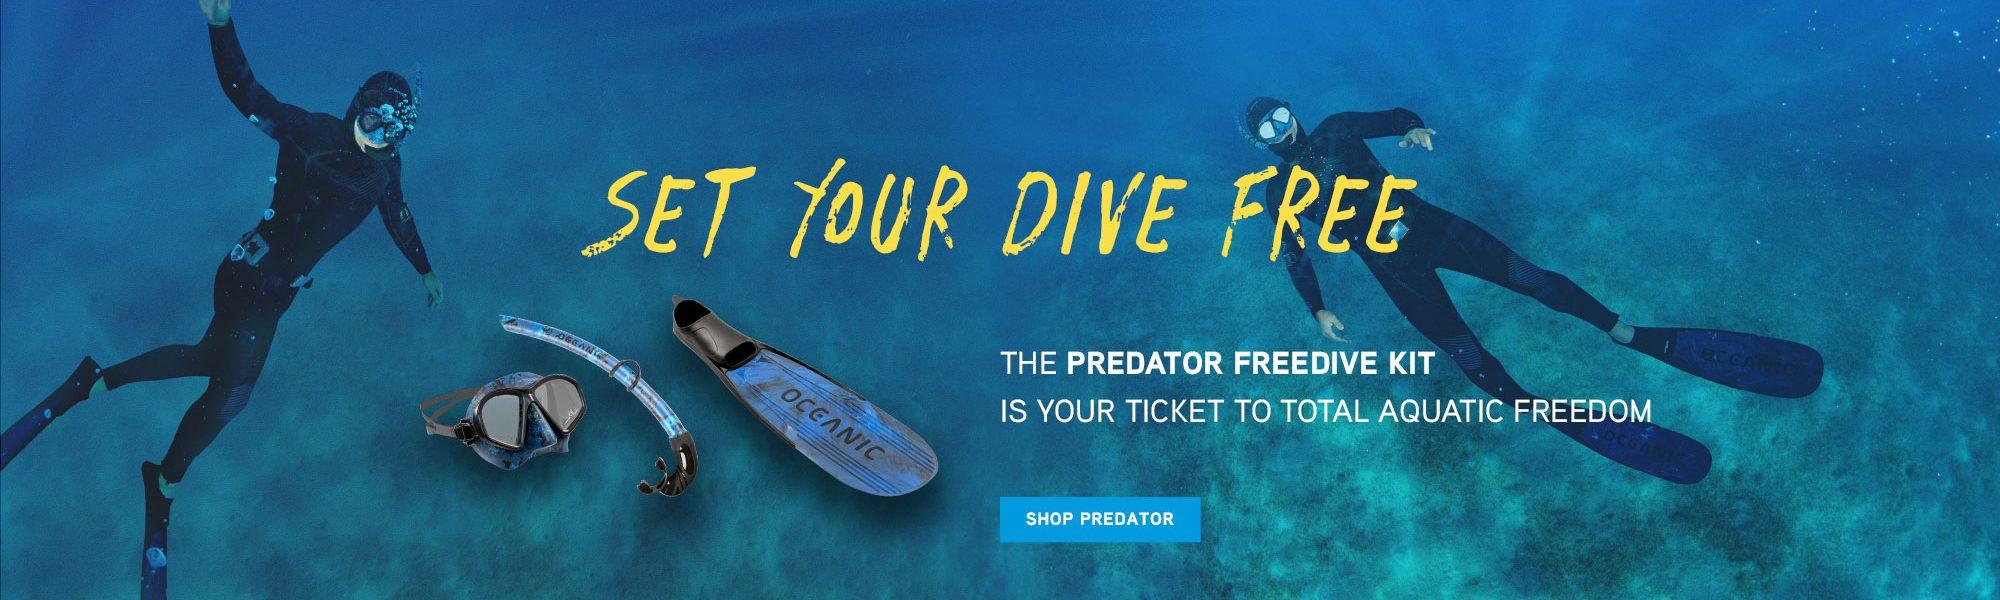 Predator Freediving